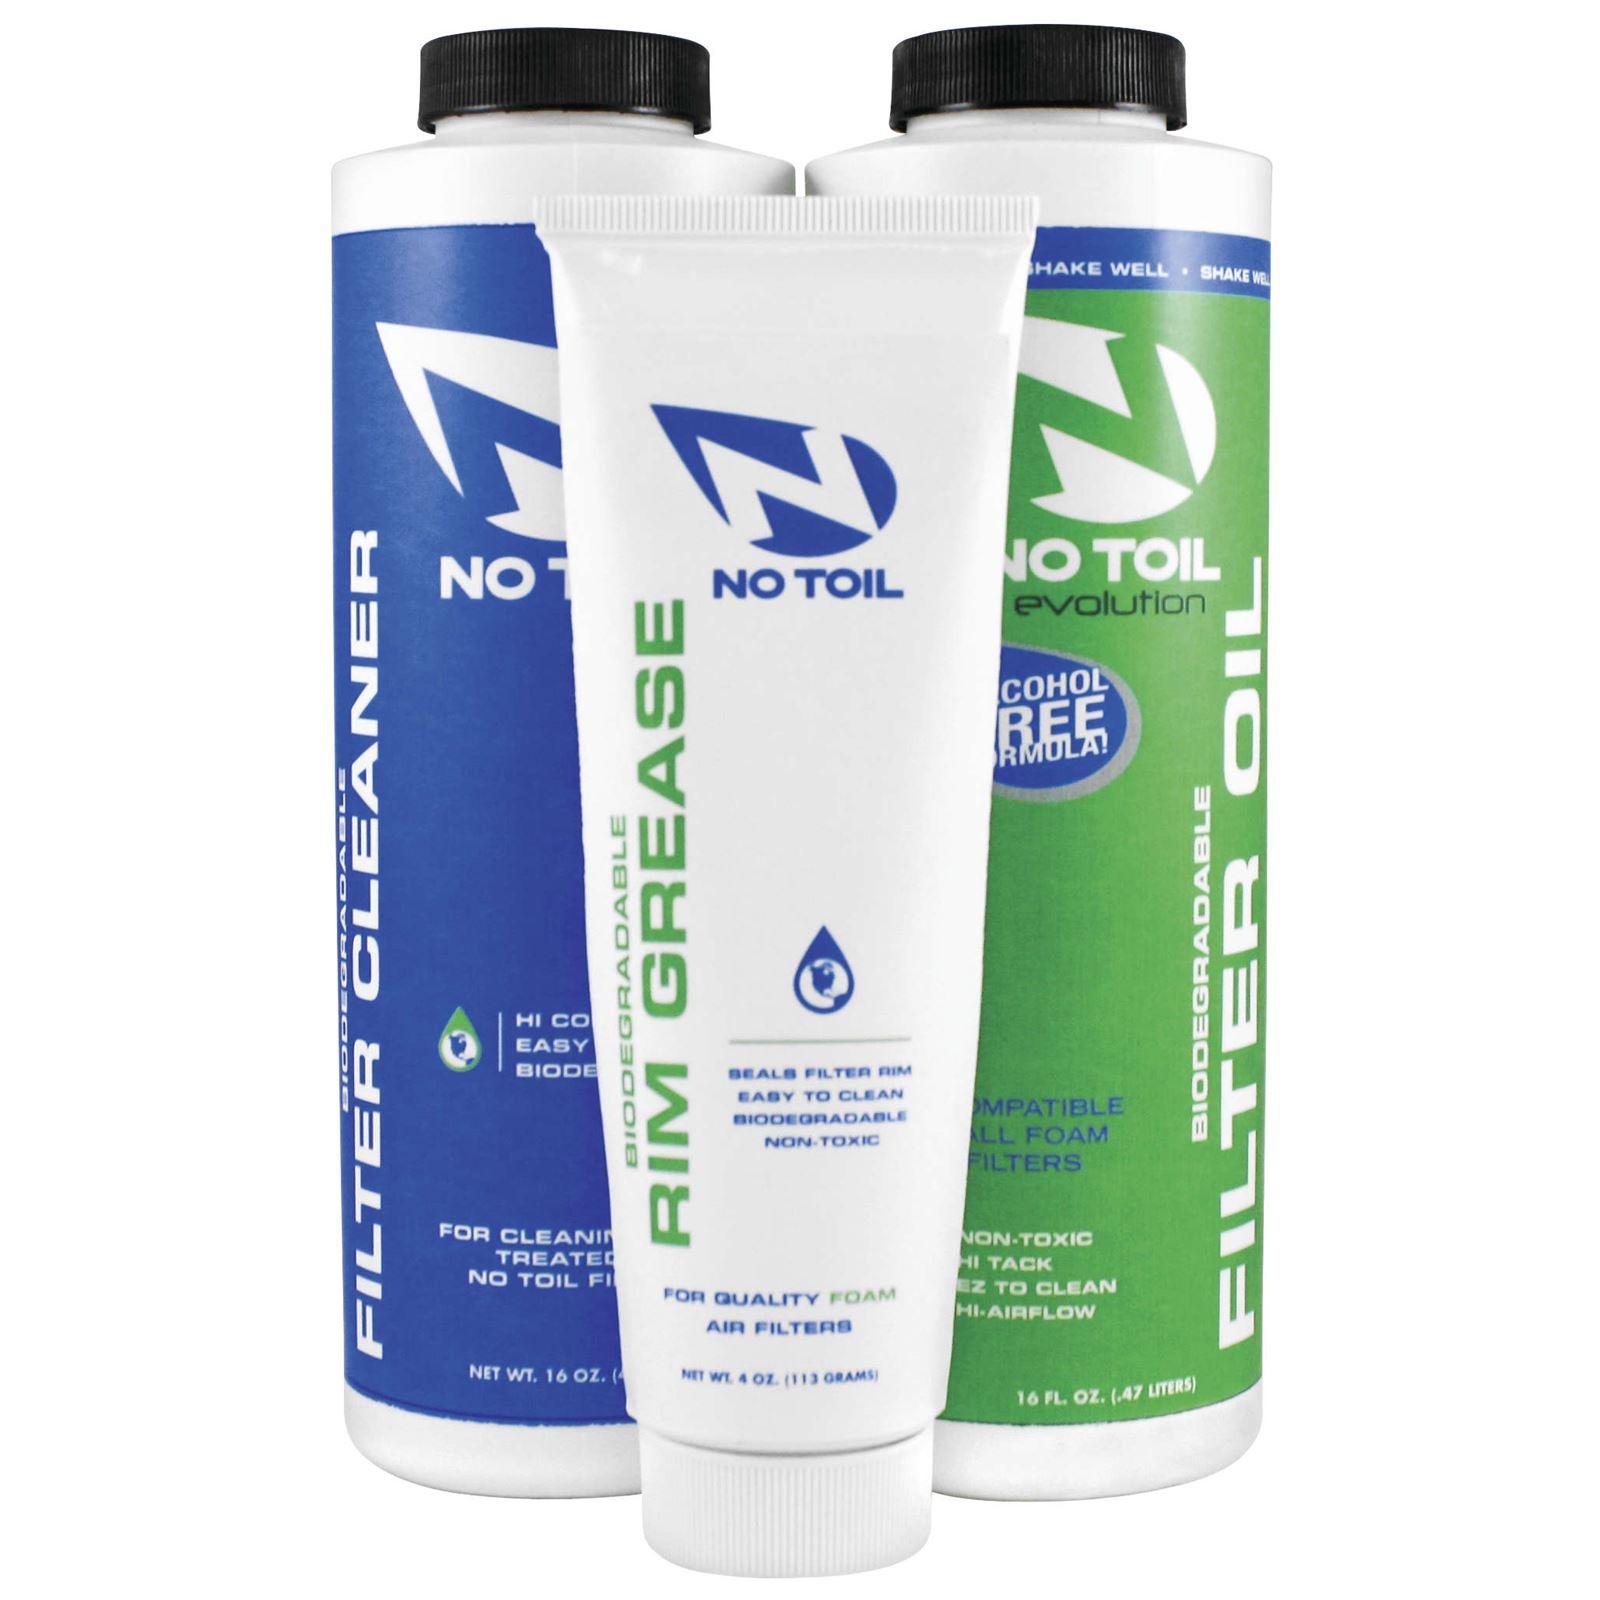 No Toil Evolution Air Filter Oil